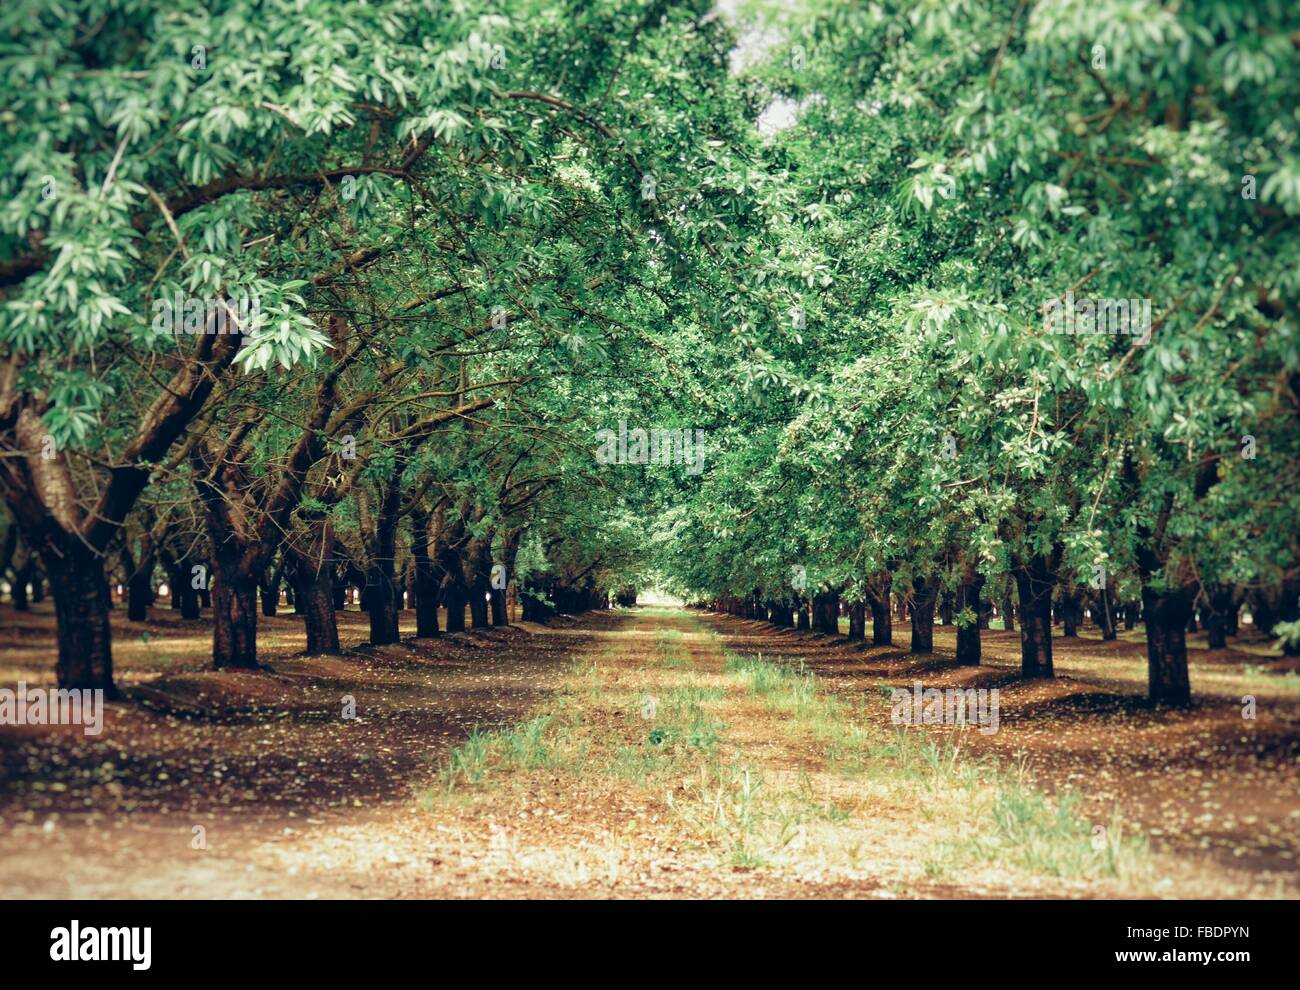 Callejón Tree-Lined Foto de stock